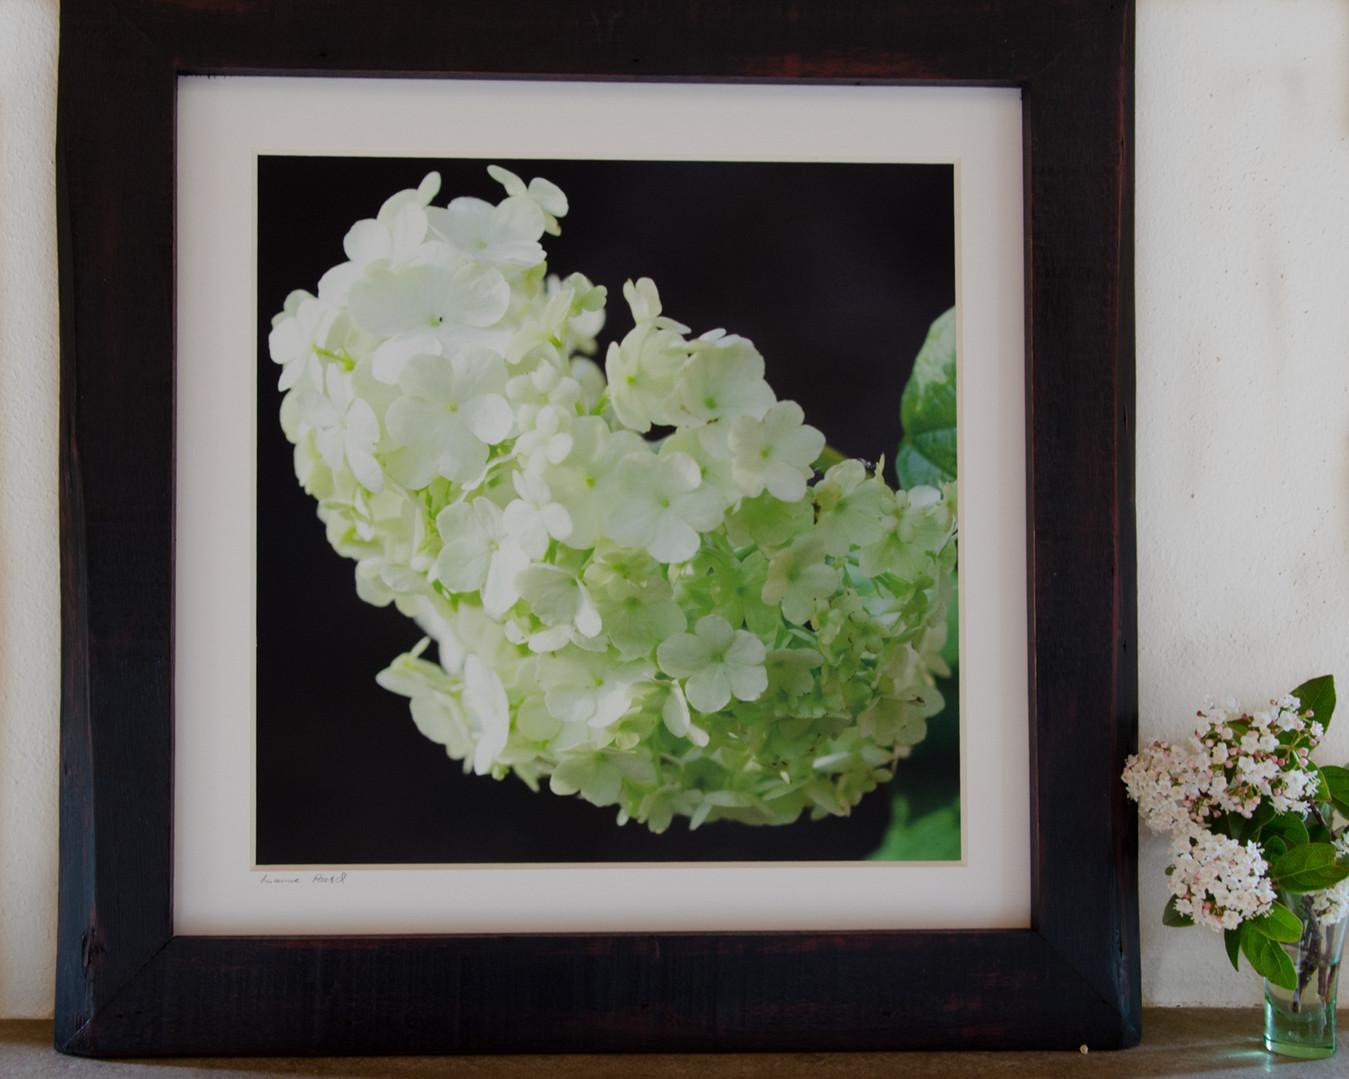 30 floral mood - Susanne Paetsch photo